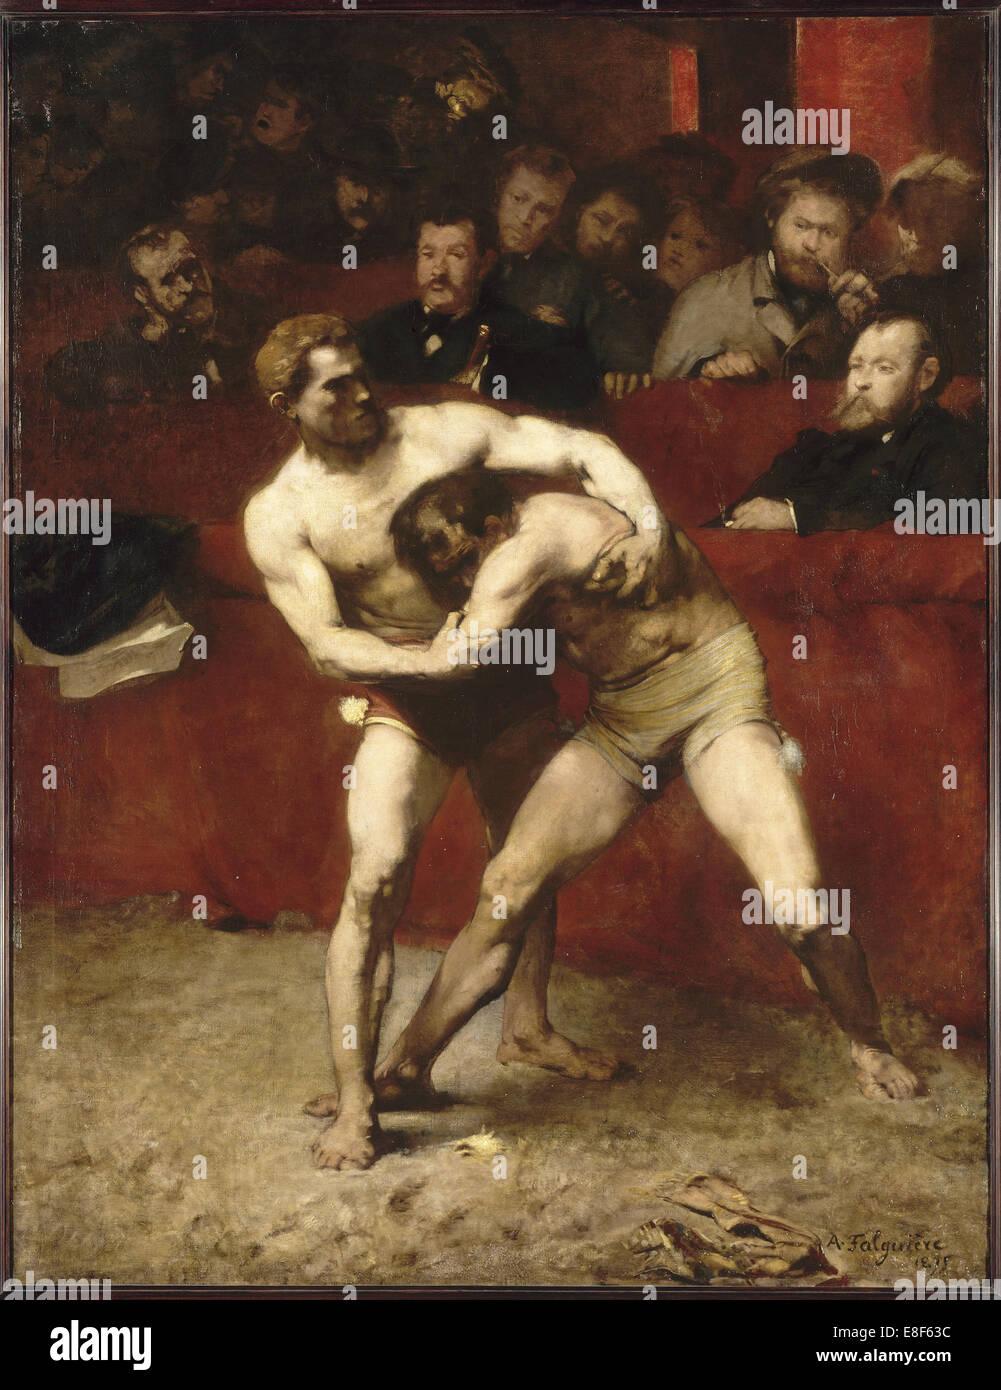 Wrestlers. Artist: Falguière, Alexandre (1831-1900) - Stock Image